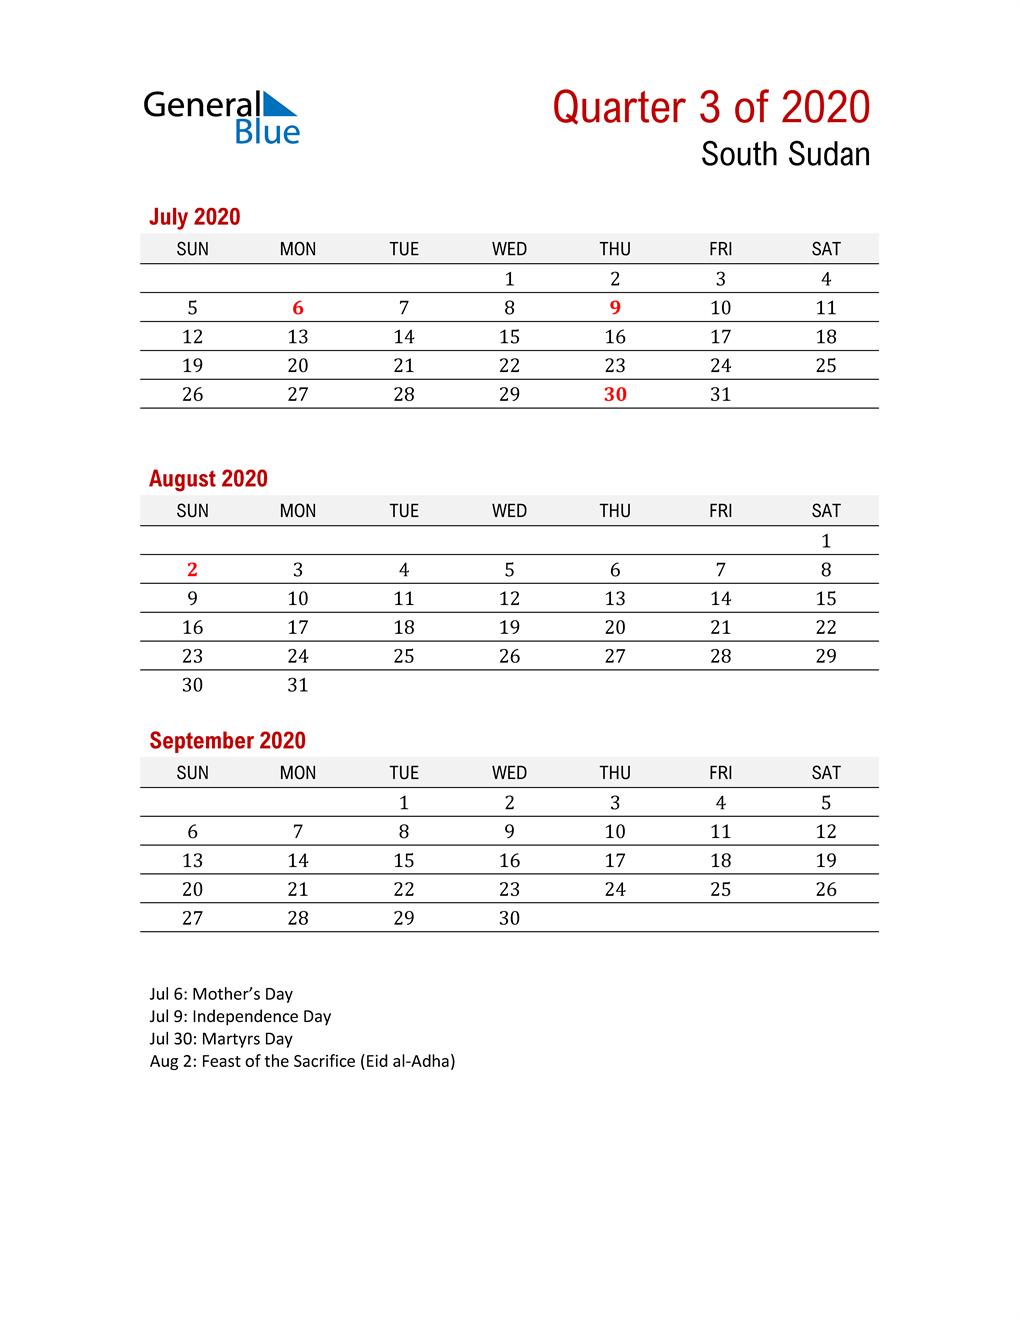 Printable Three Month Calendar for South Sudan